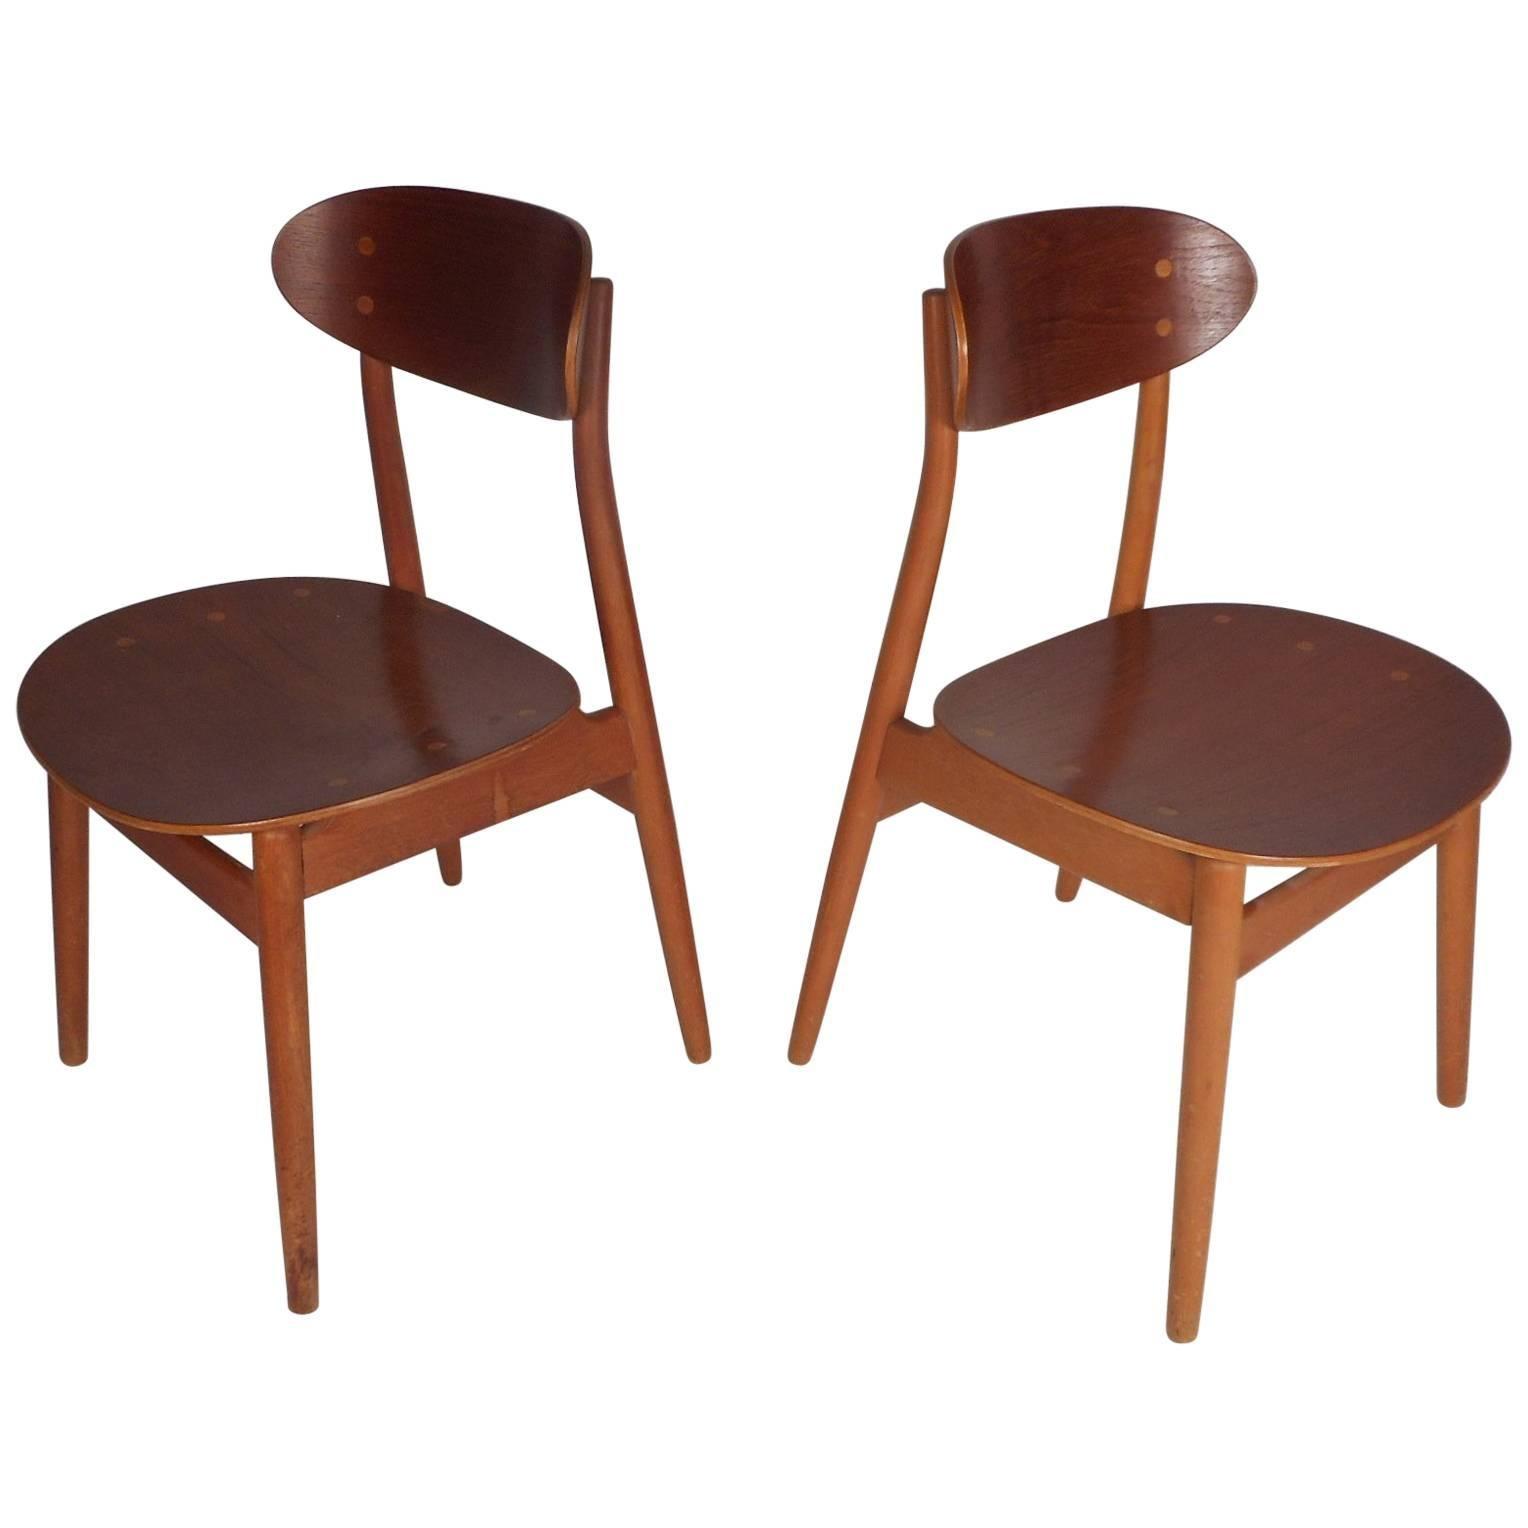 pair of mid century modern danish chairs for sale at 1stdibs rh 1stdibs com modern danish furniture uk modern danish furniture uk